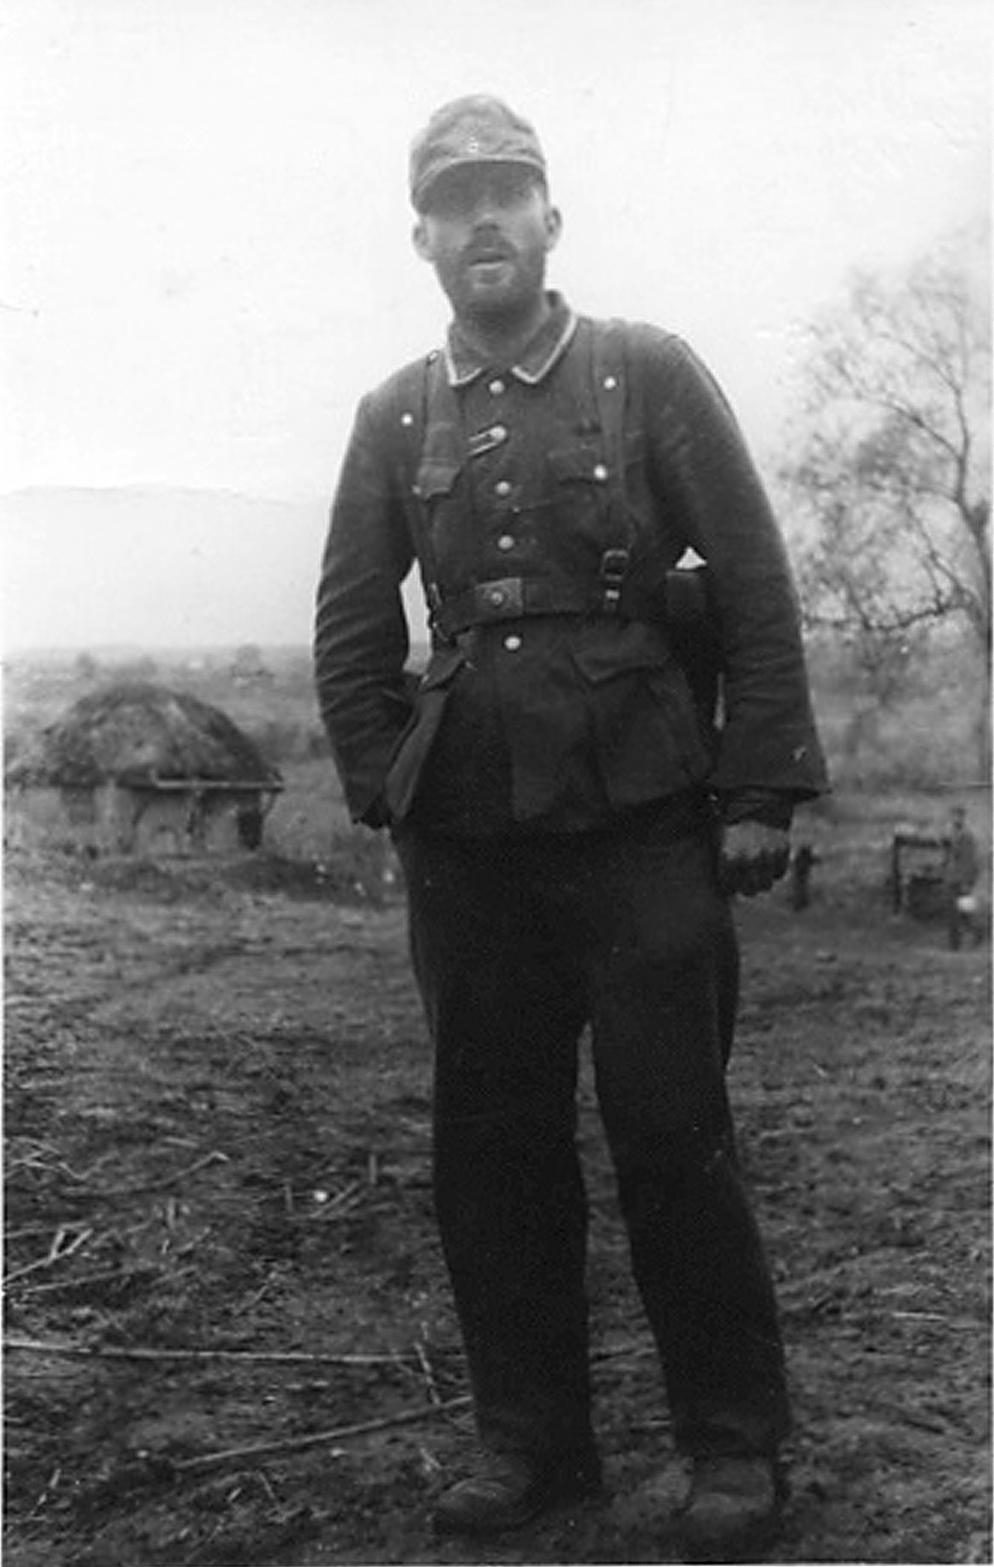 Ukraine, October 1942 - the last surviving Platoon Leader of the battalion.